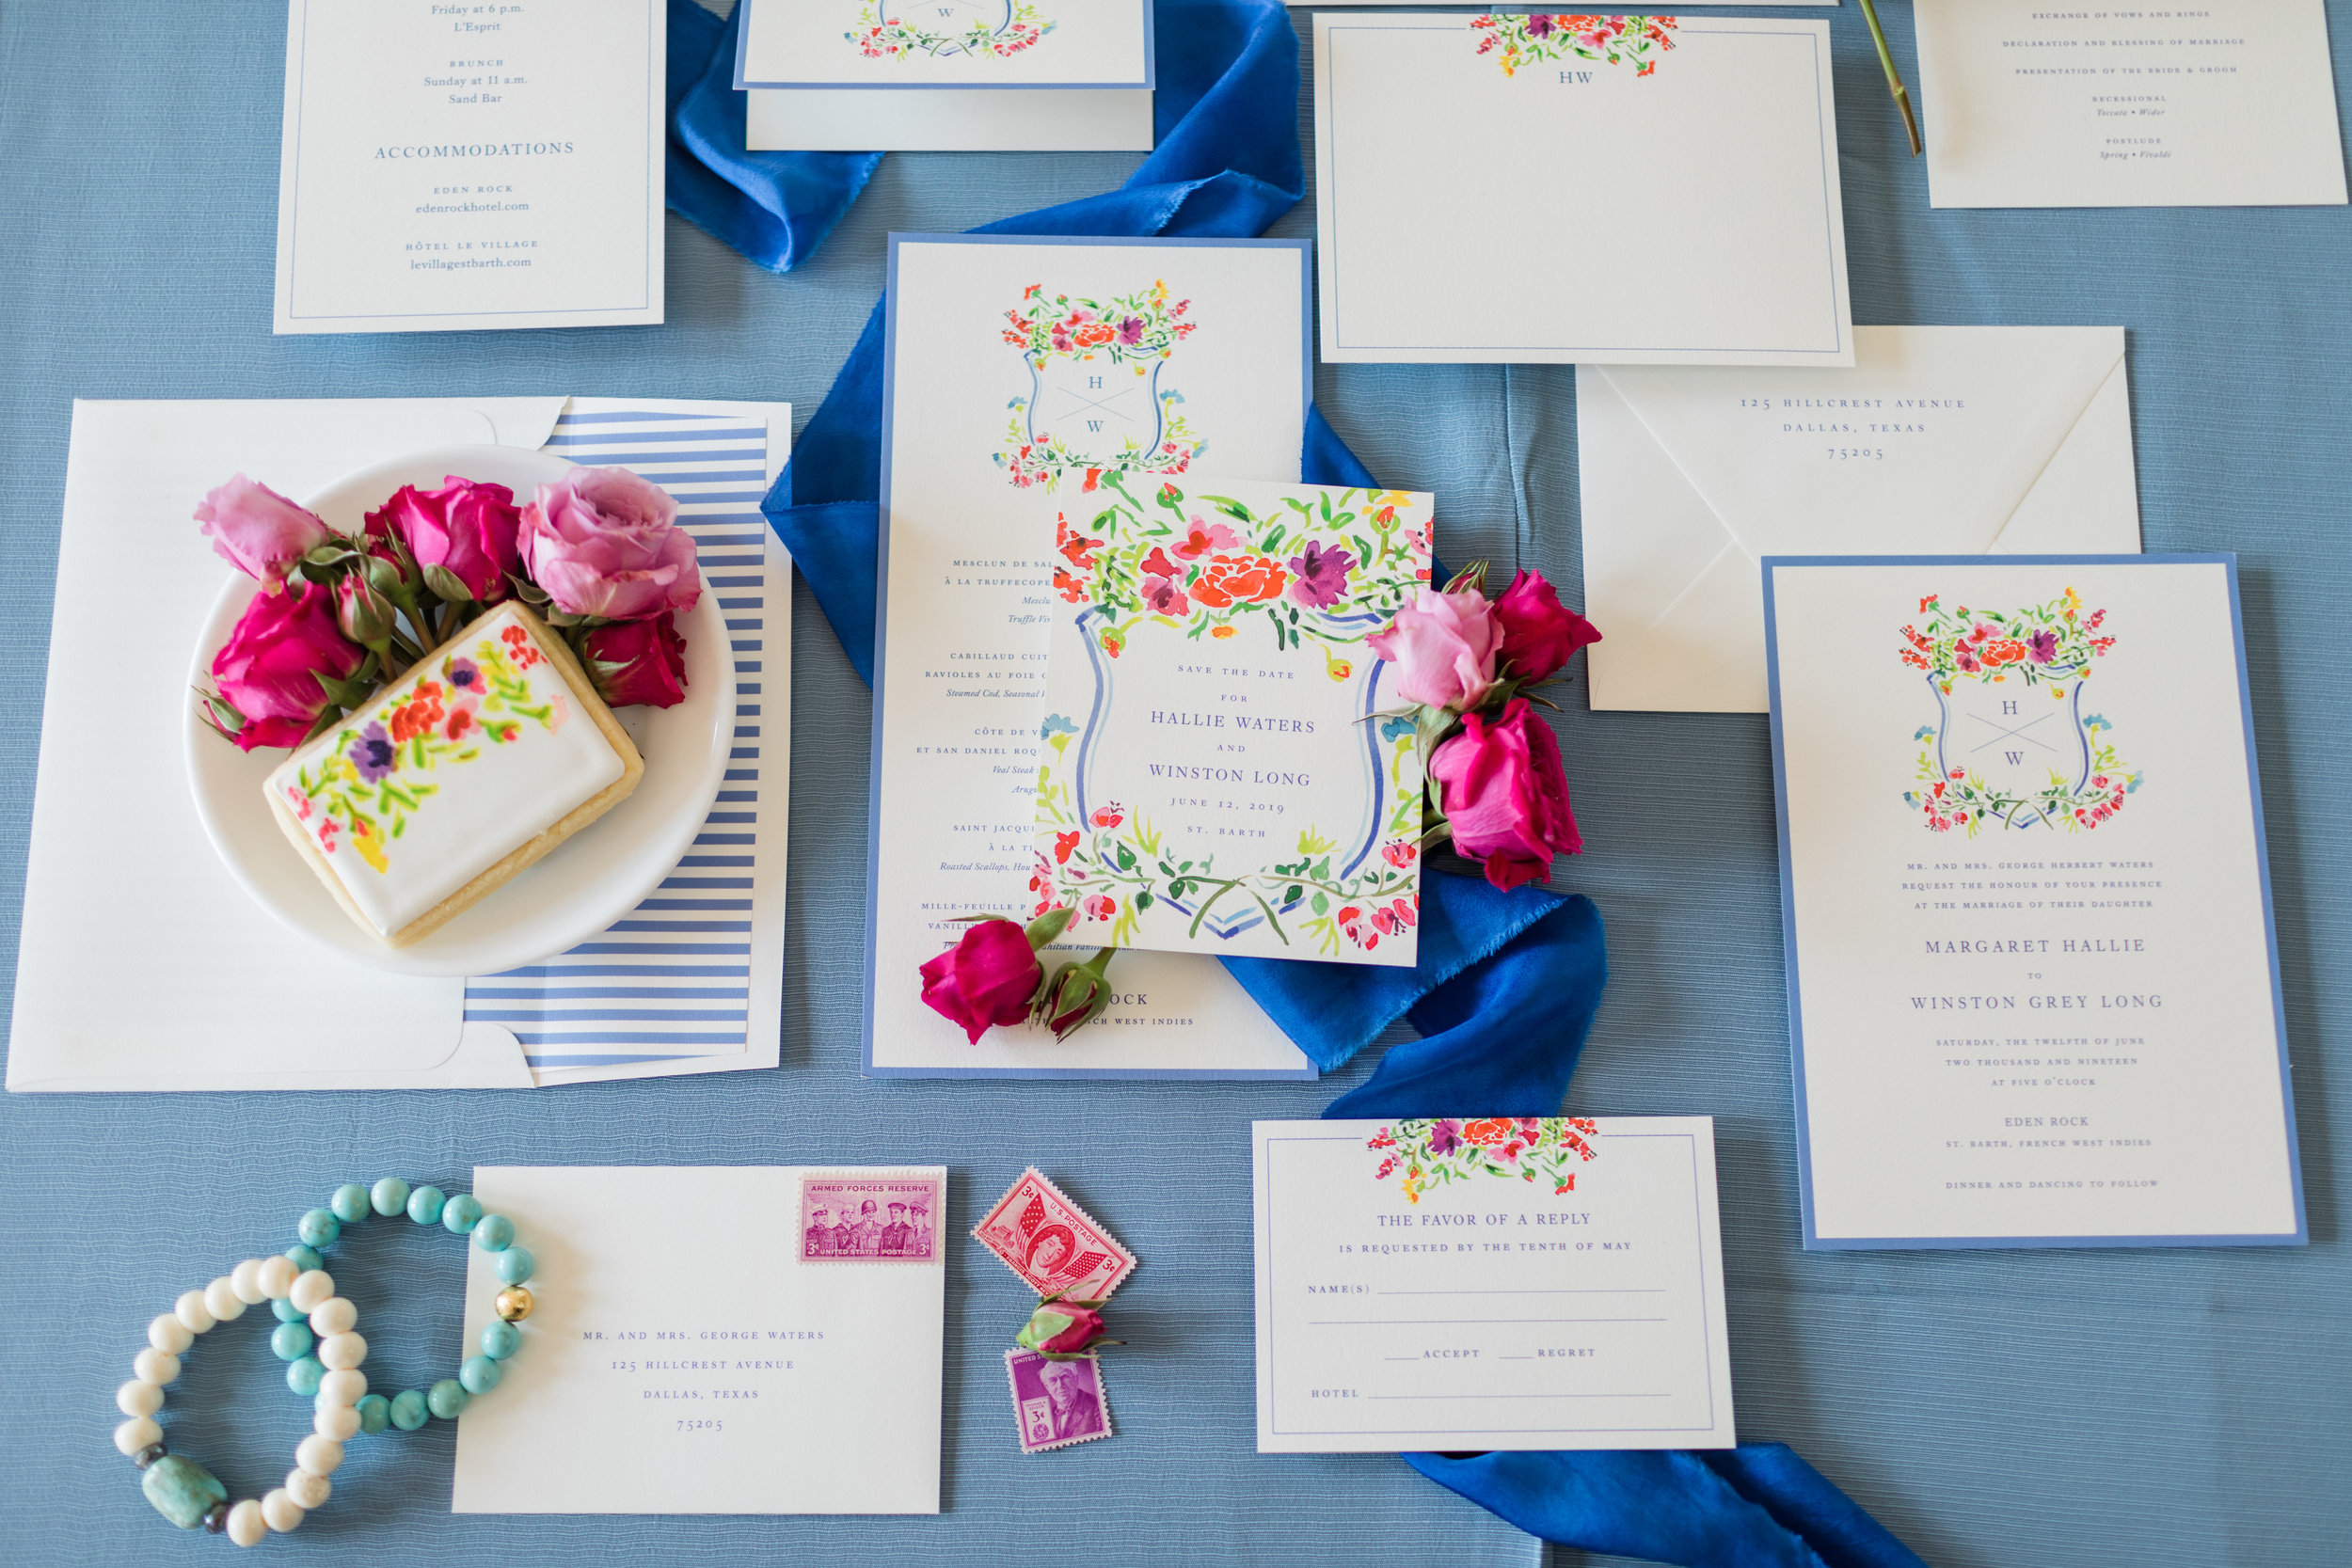 Handley Breaux Desings | Southern Wedding Planner, Event Designer, Southern Weddings, Birmingham Wedding Planner, Birmingham Bride, Birmingham Weddings, Alabama Weddings, Alabama Wedding Planner, Alabama Bride, Birmingham Events